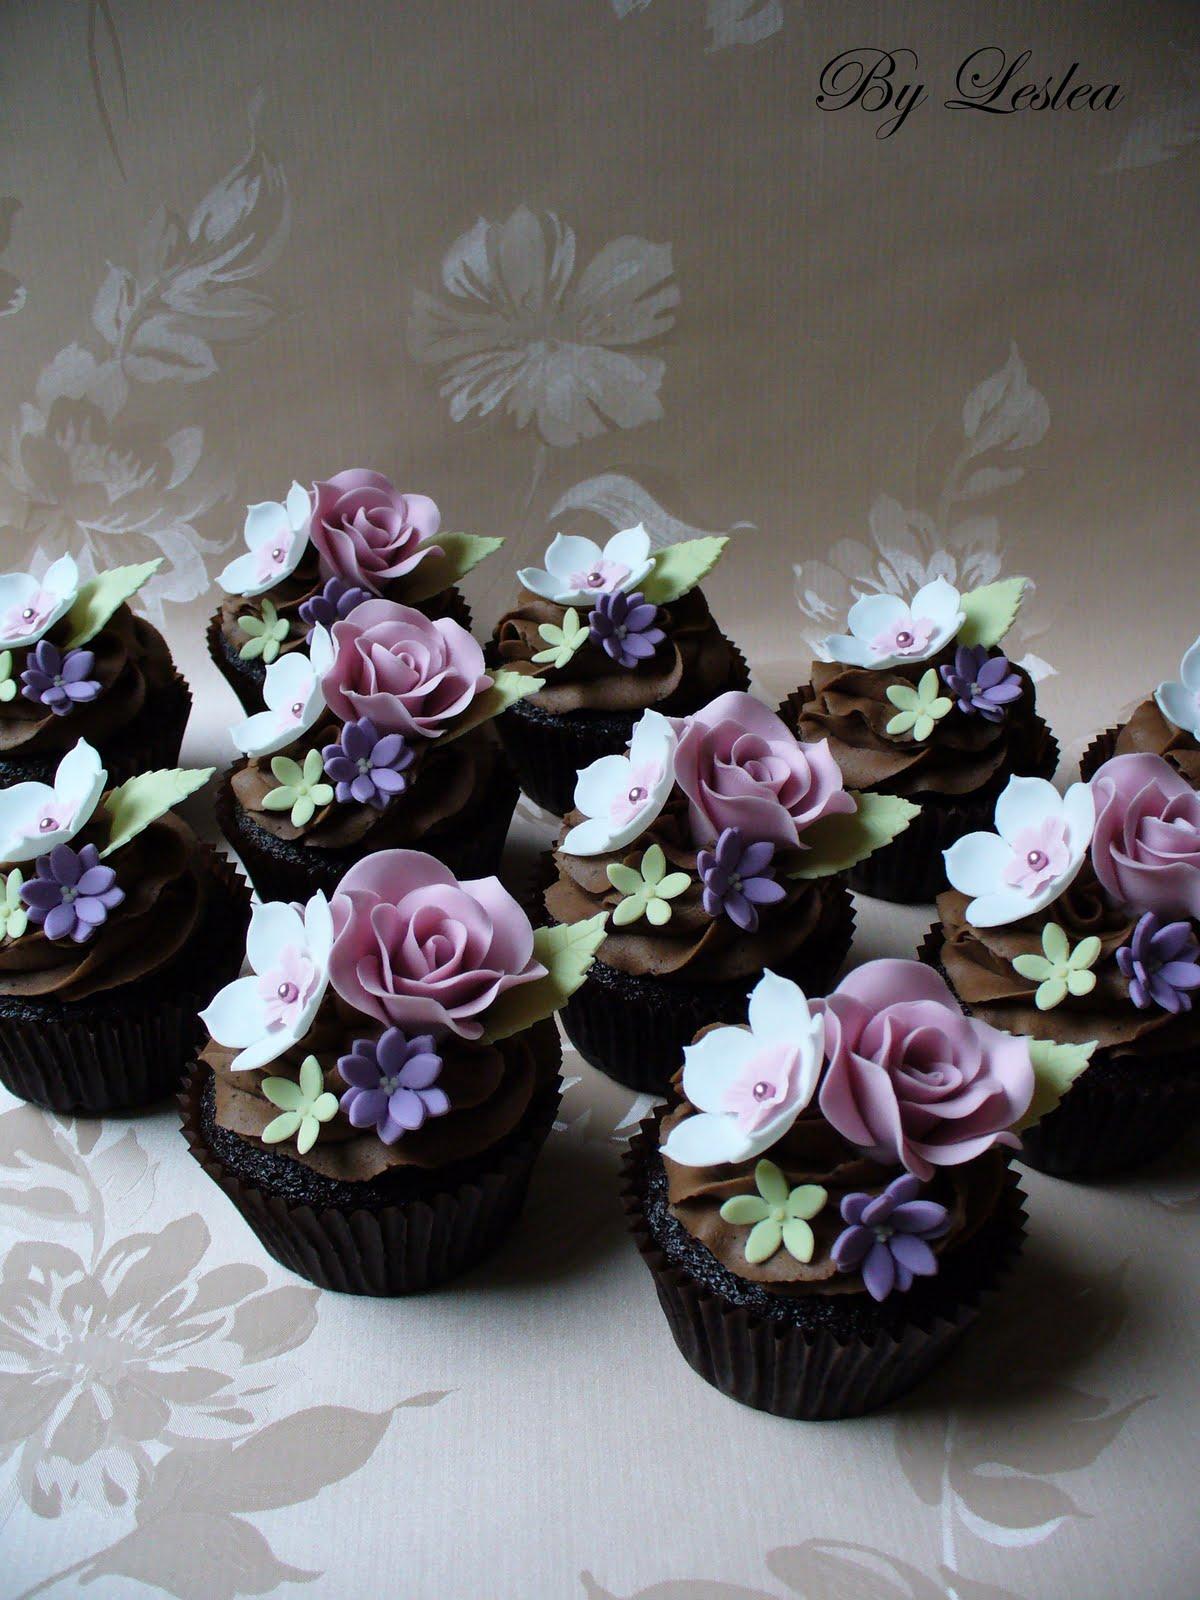 Leslea Matsis Cakes Rose Cupcakes